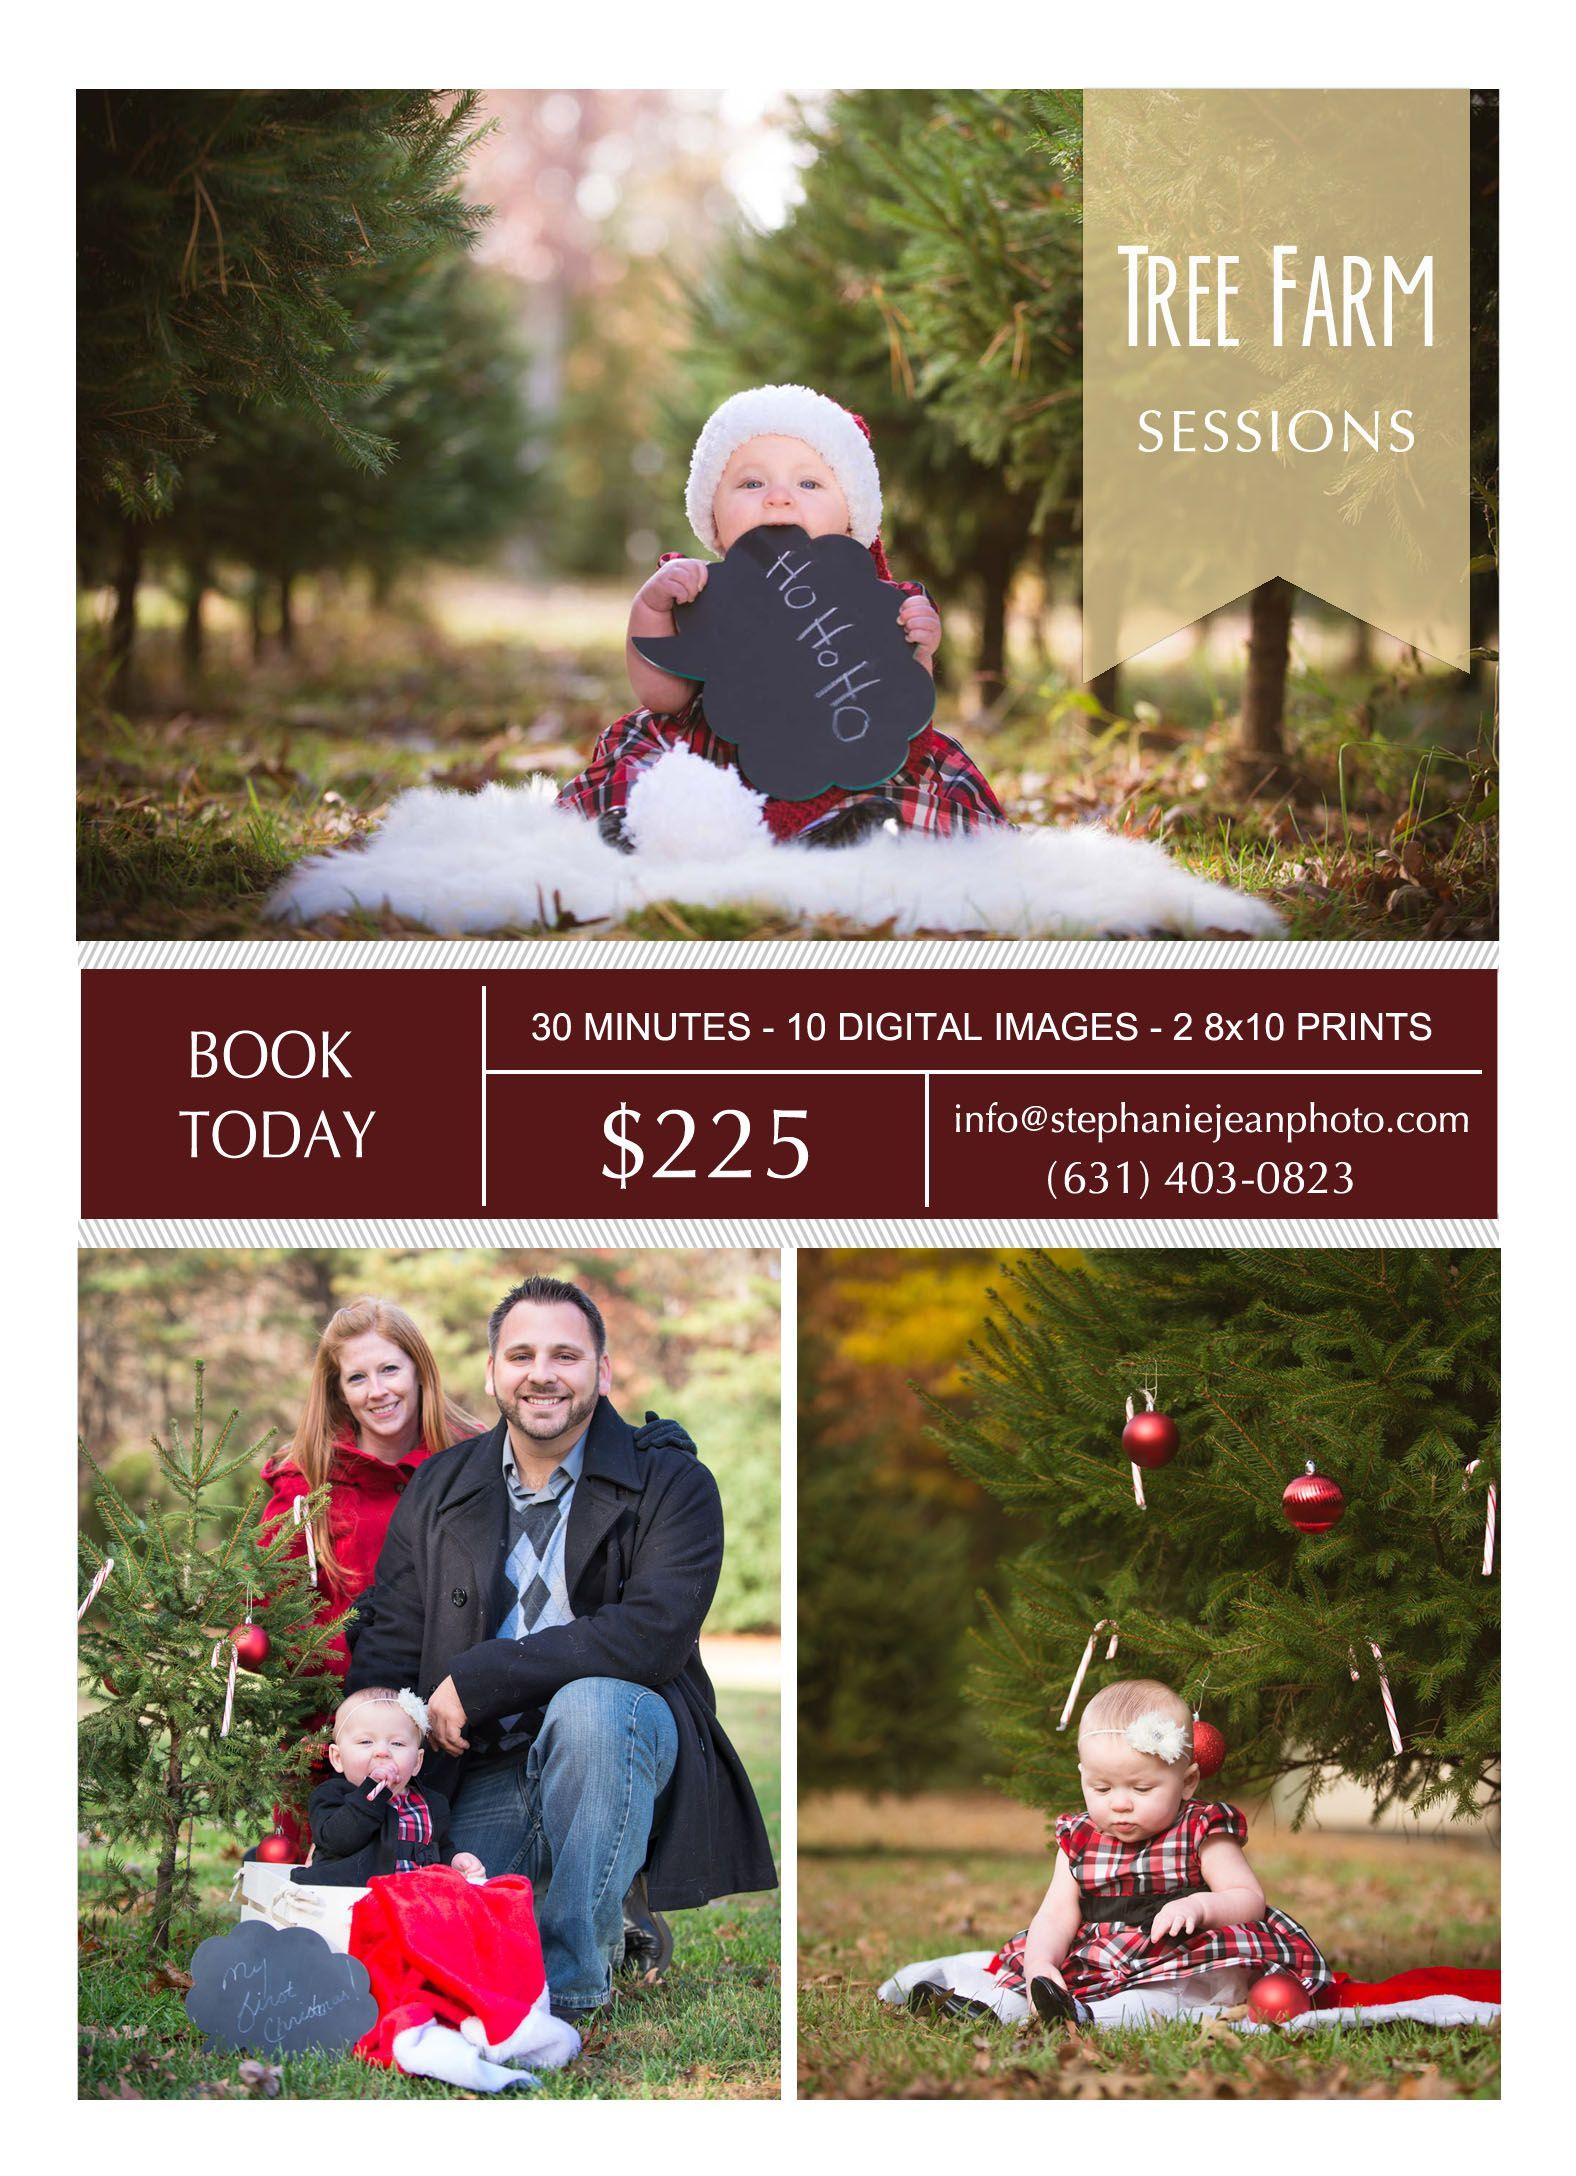 Stephanie Jean Photography Christmas Portraits Christmas Photography Christmas Photos